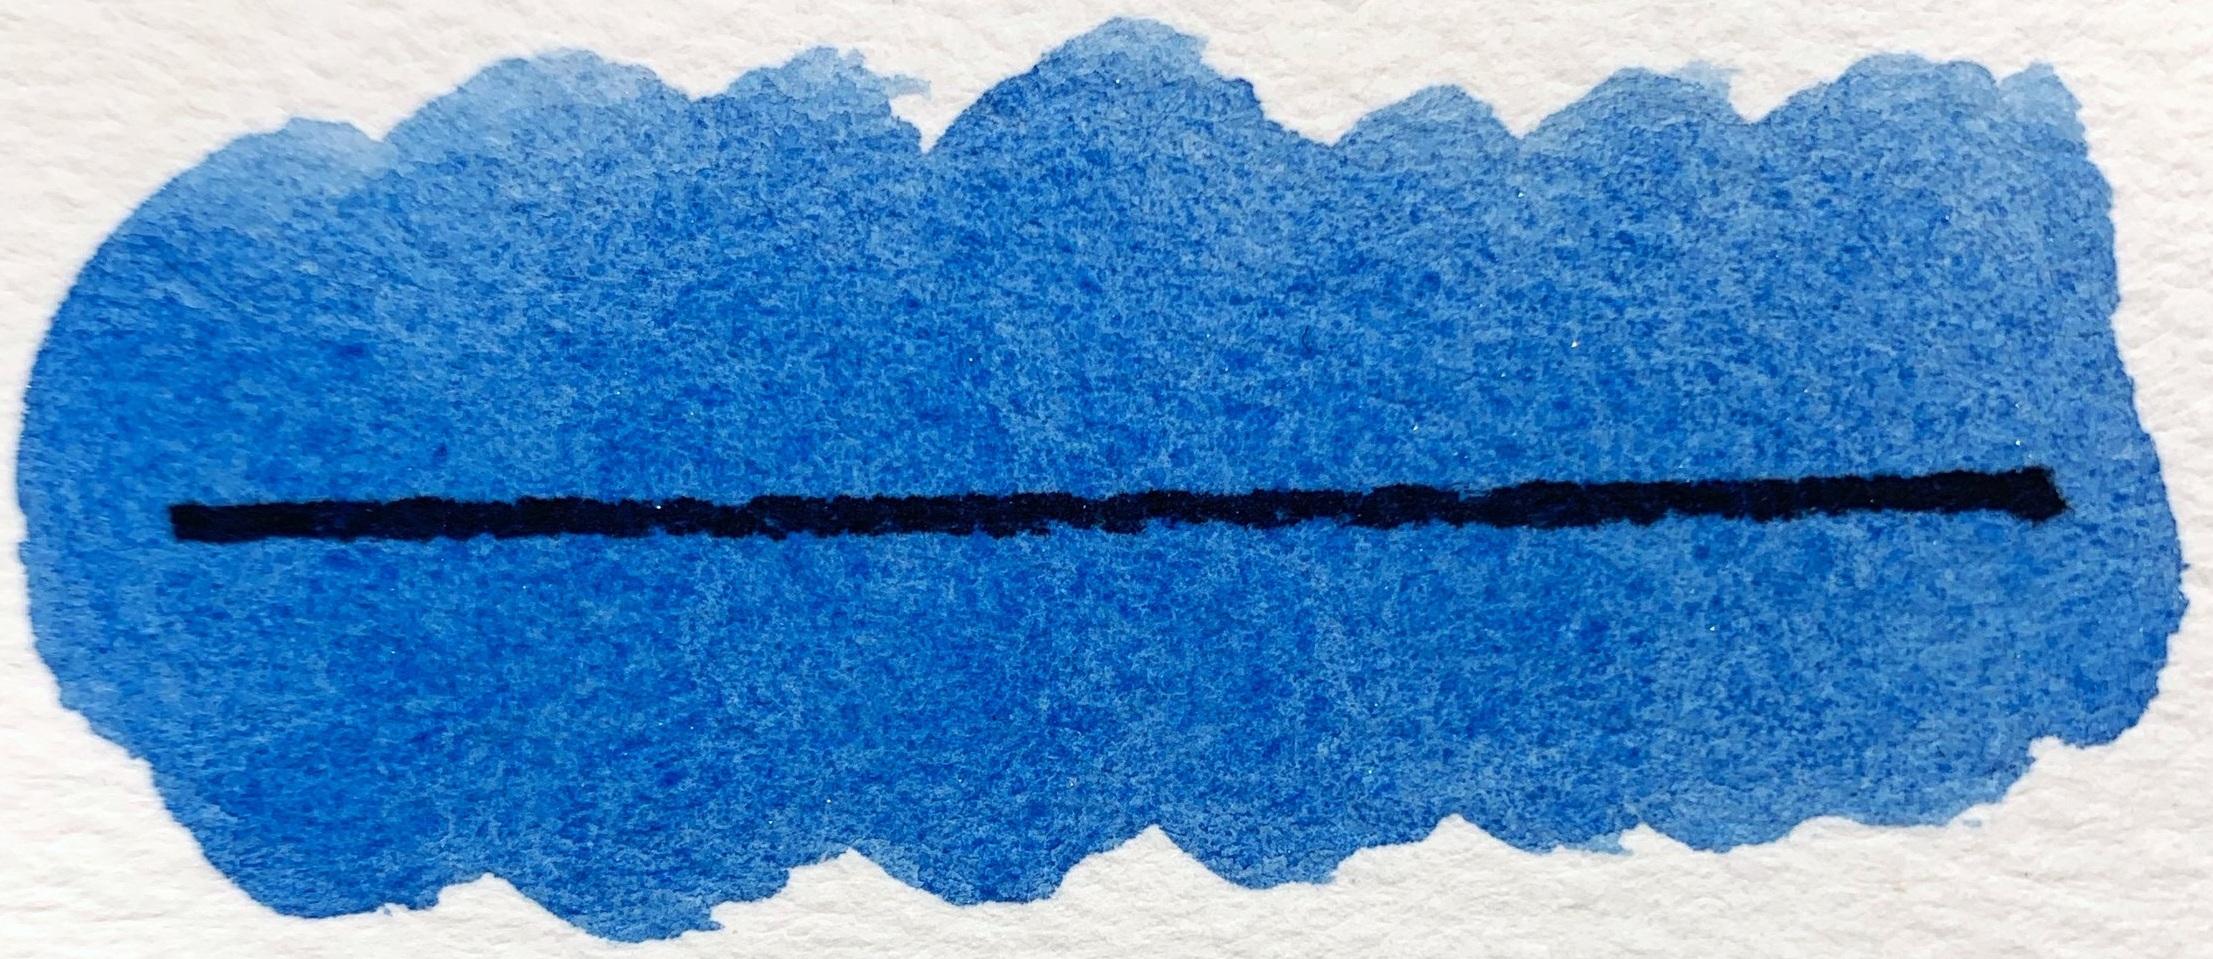 Blue Dusk - PB15, semitransparent, good lightfastness, staining